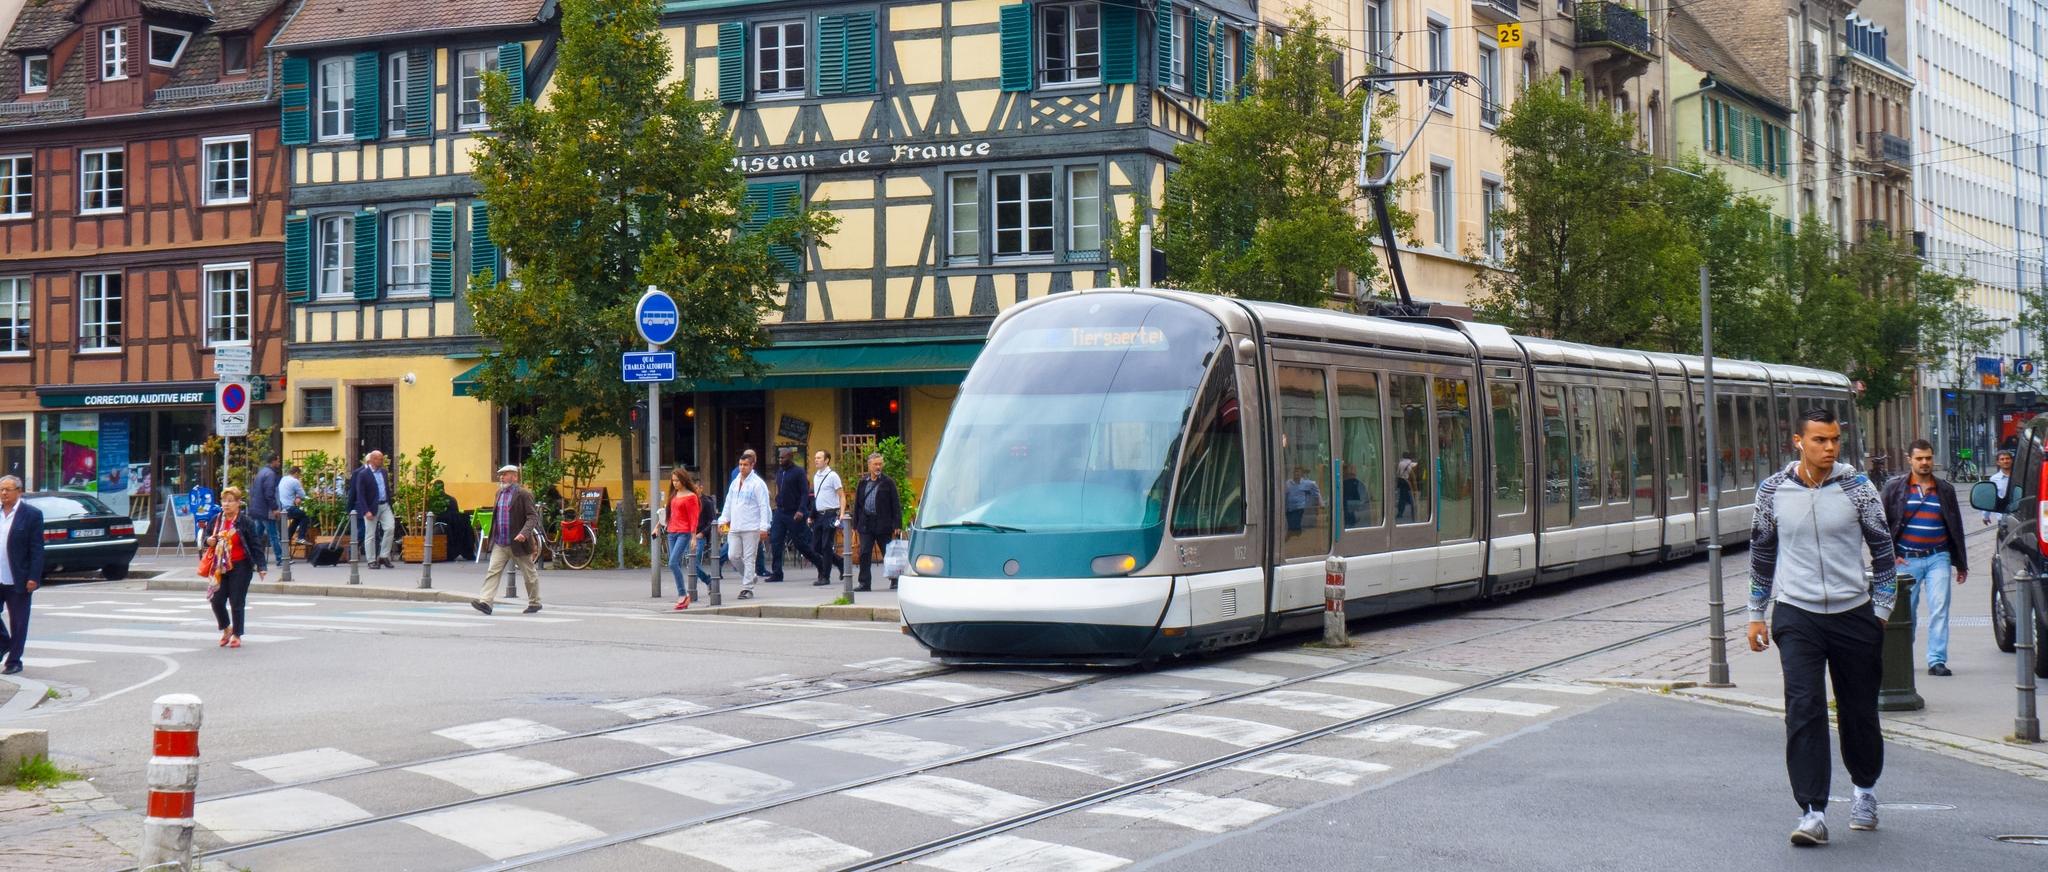 Strasbourg Public Transport